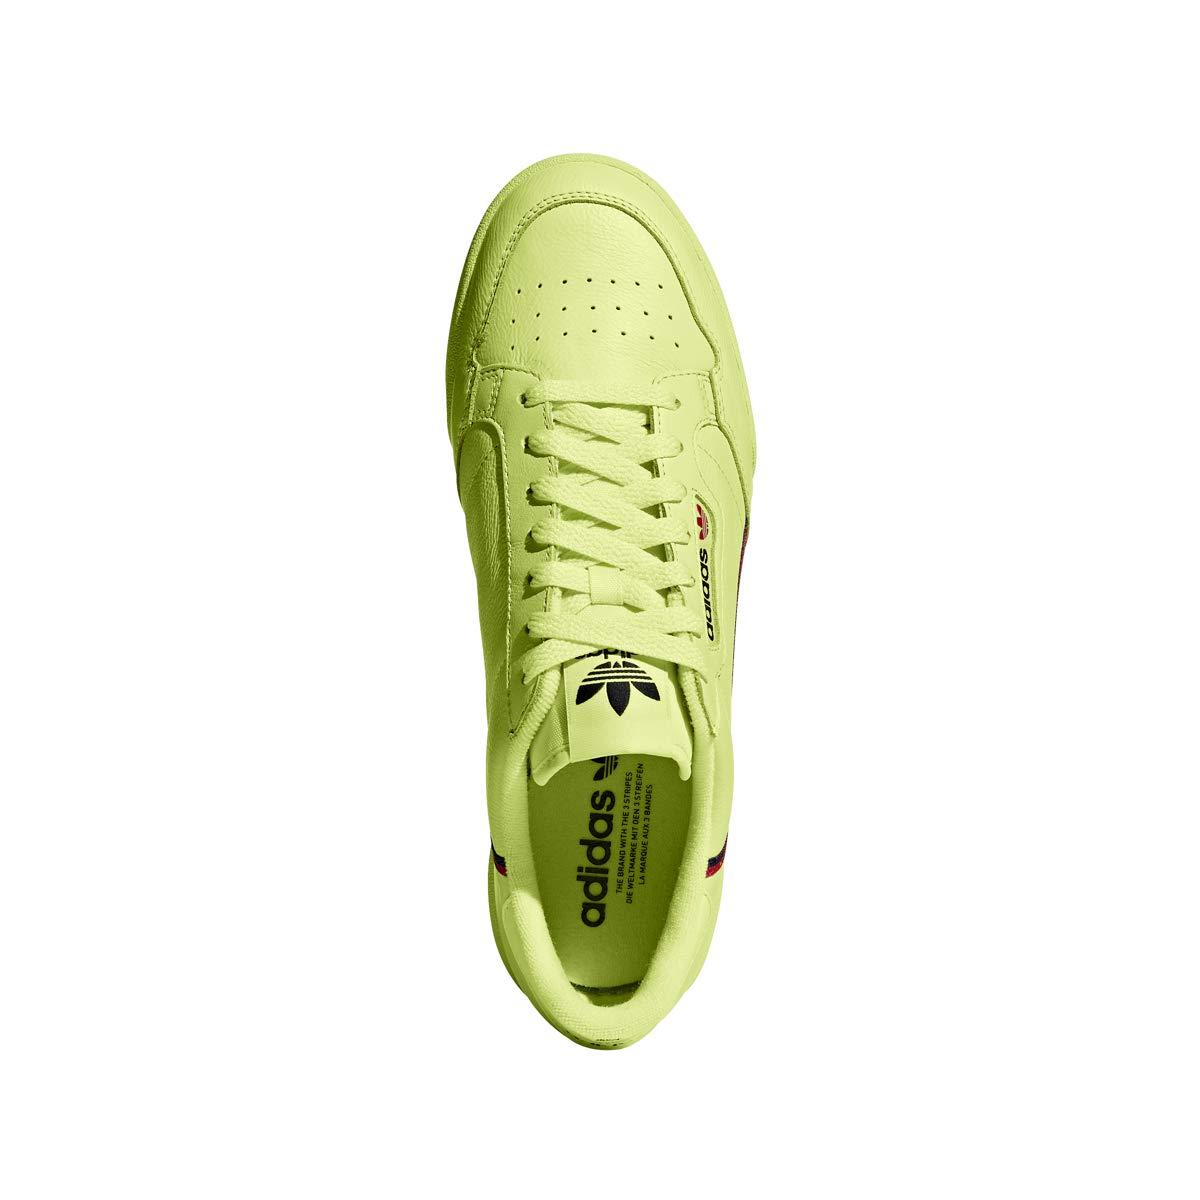 premium selection 48c77 a4f21 Amazon.com  adidas Continental 80 (Semi Frozen YellowScarletNavy) Mens  Shoes B41675  Fashion Sneakers